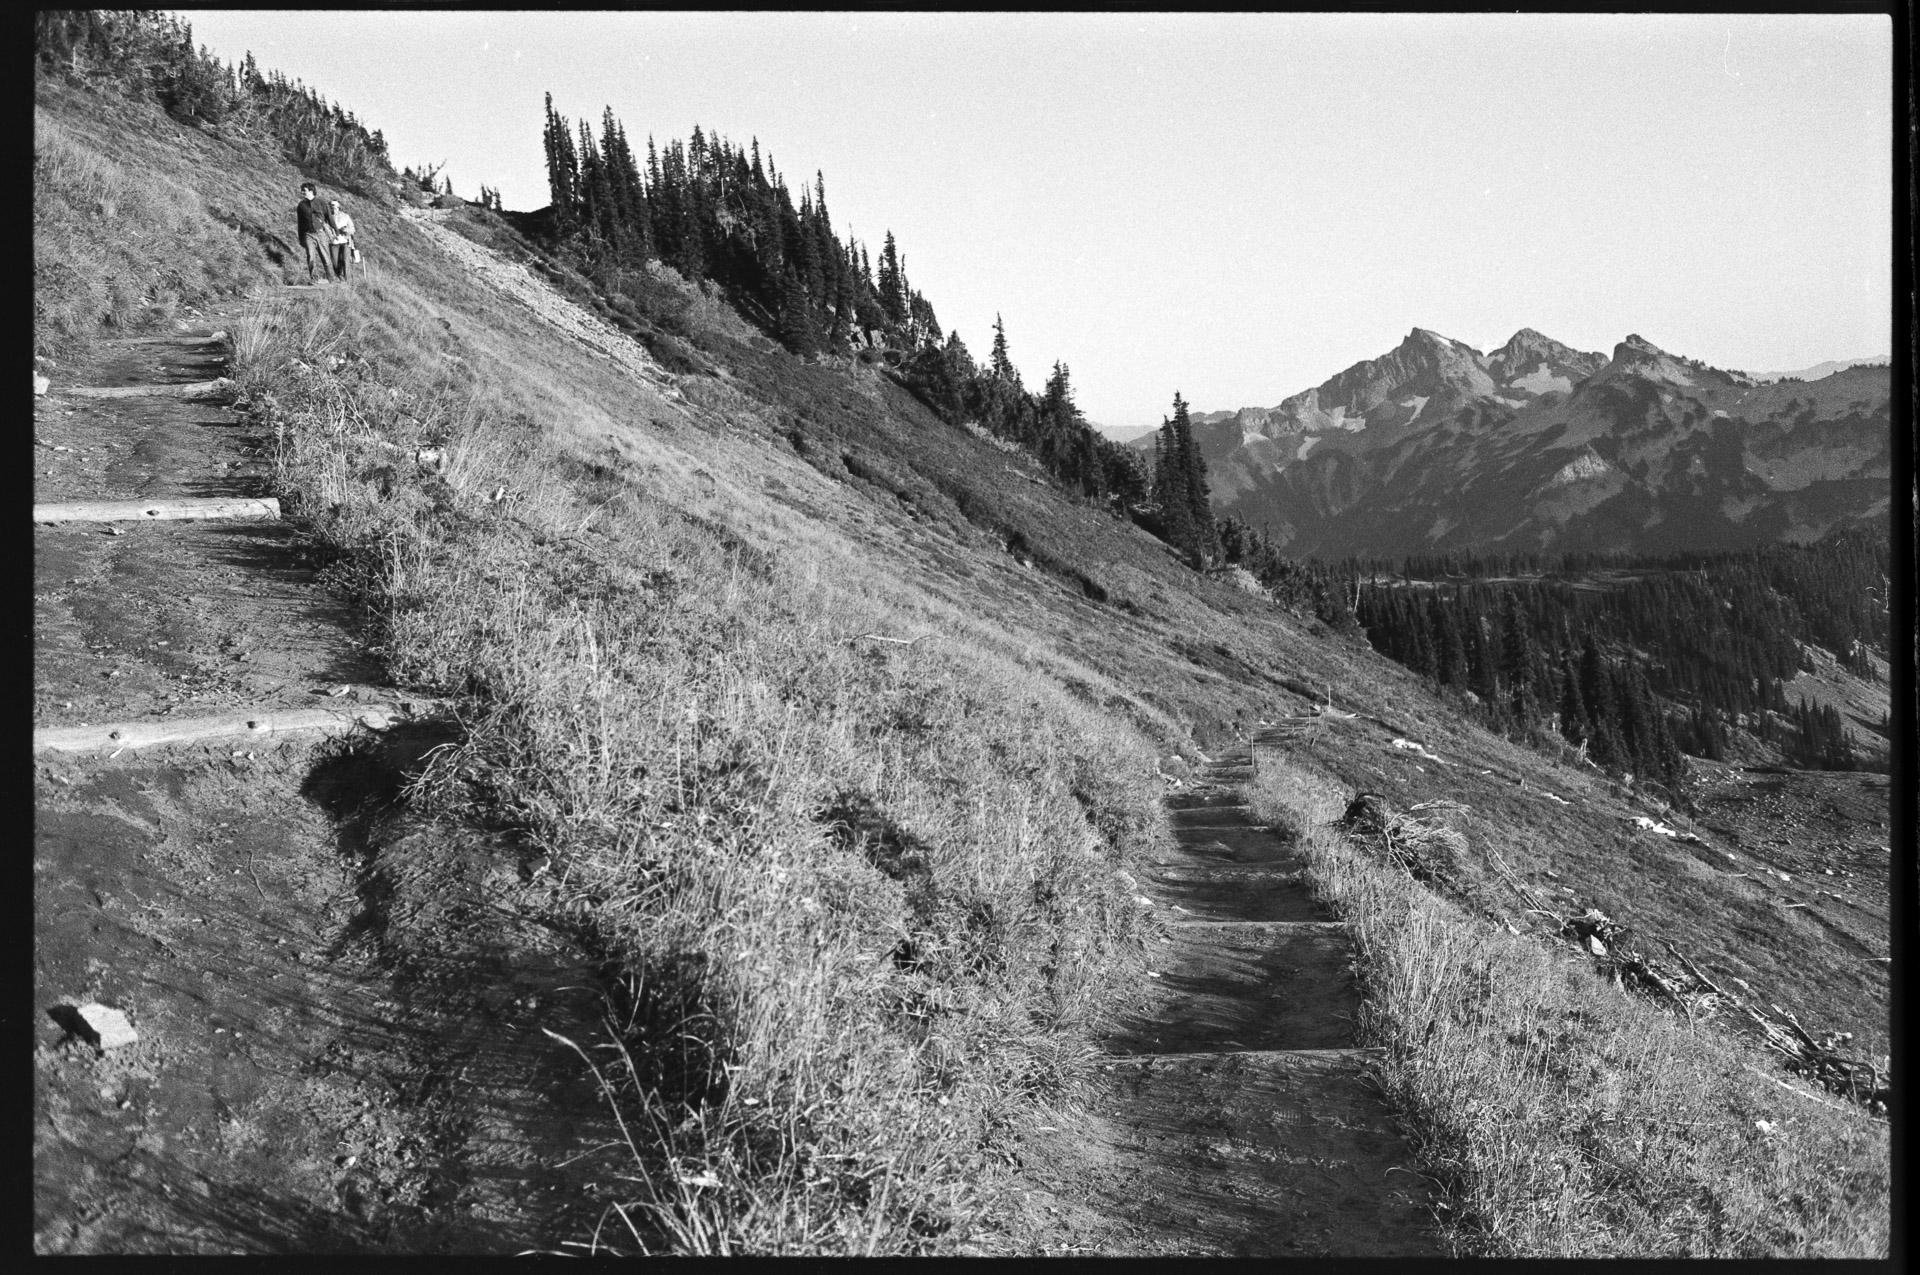 Walk Mt Ranier—Chris-Page-Art-11.jpg